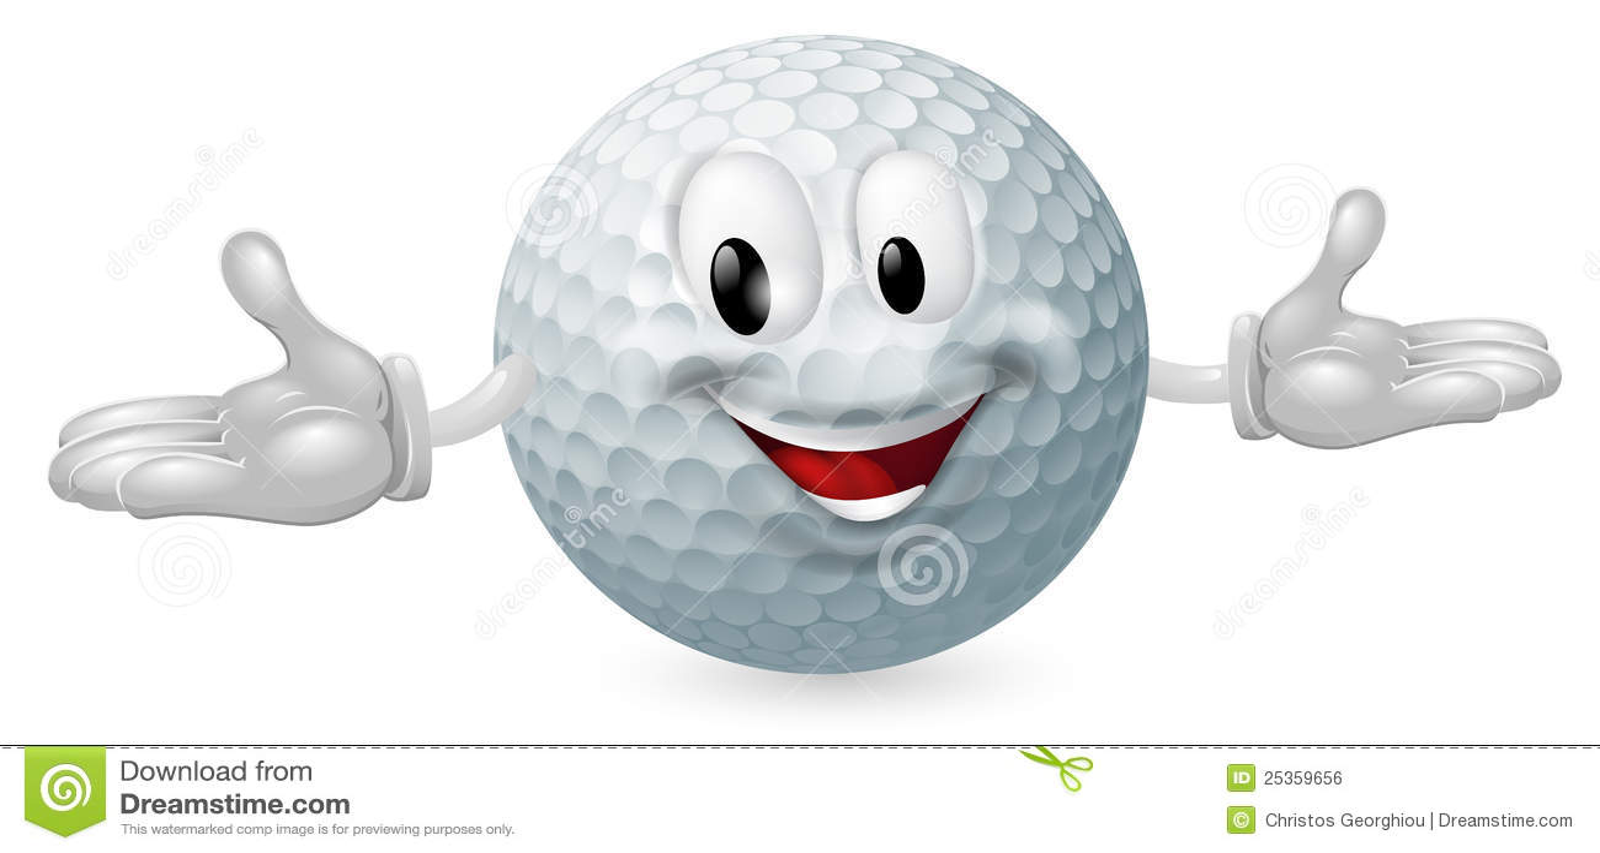 Mascotte de bille de golf